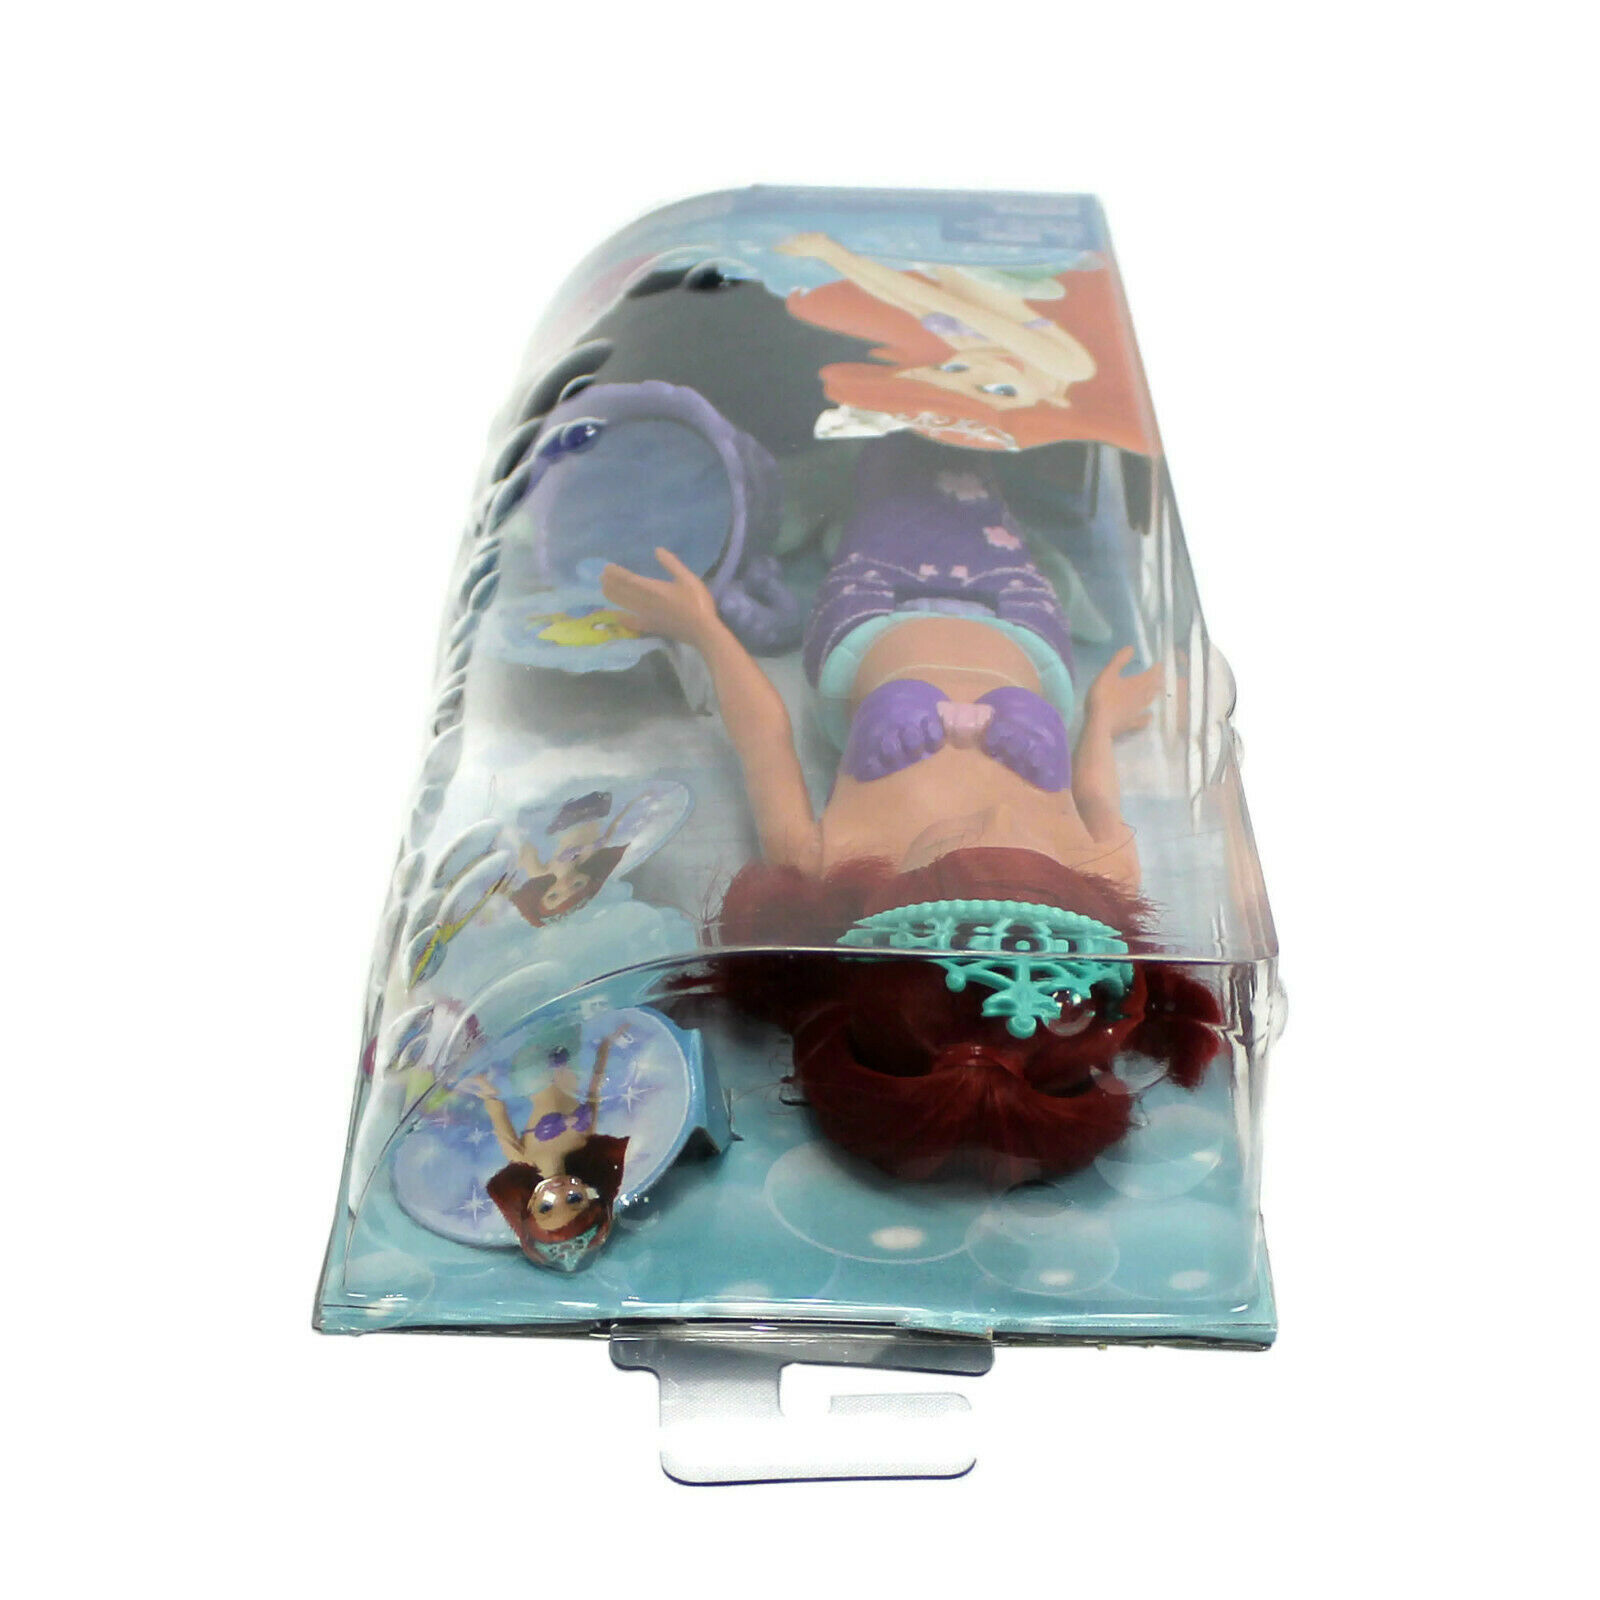 Disney Princess Doll   ARIEL   Bath Beauty Splash   THE LITTLE MERMAID   2011